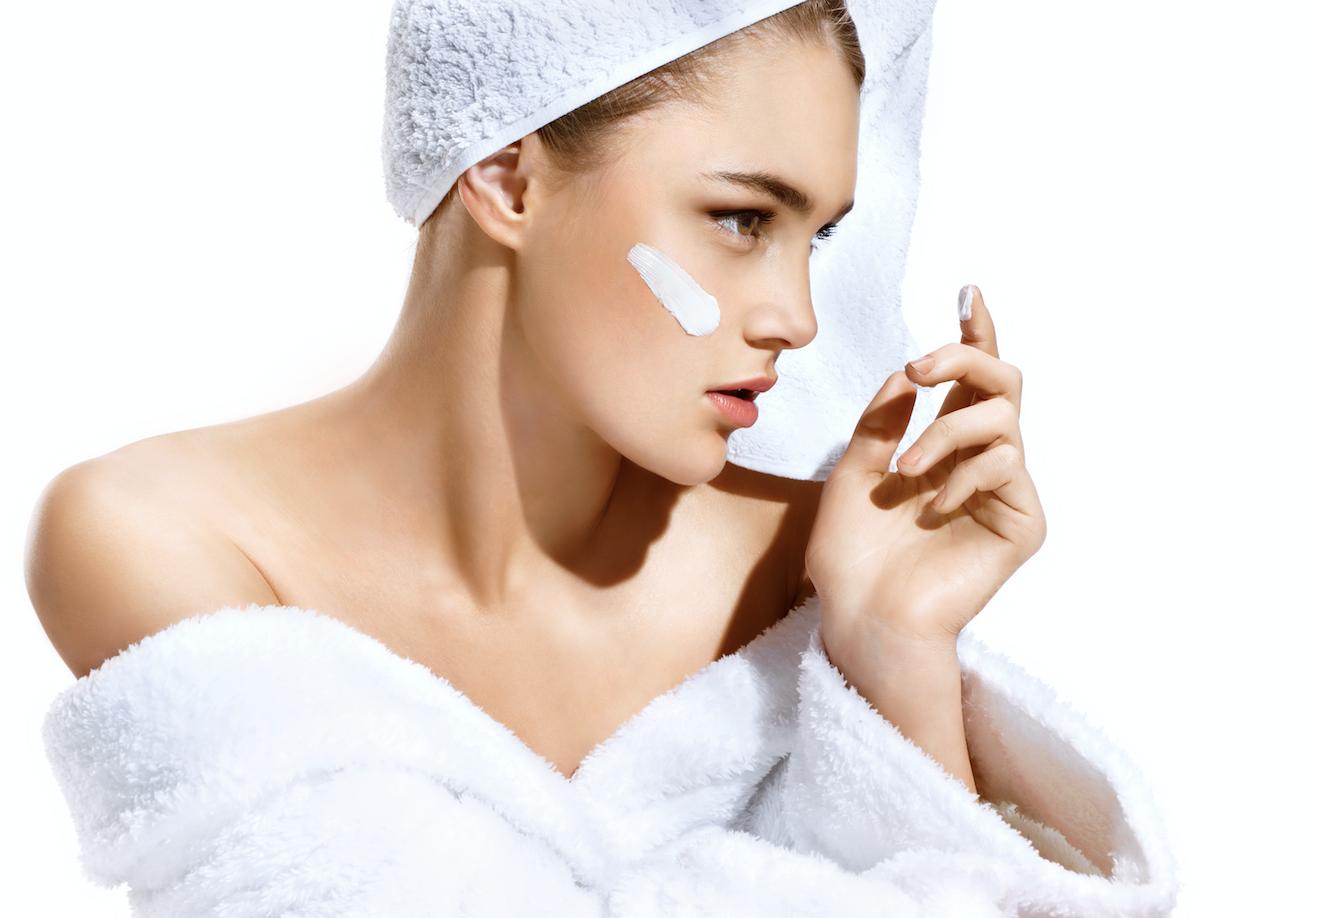 applying skin care creams,s